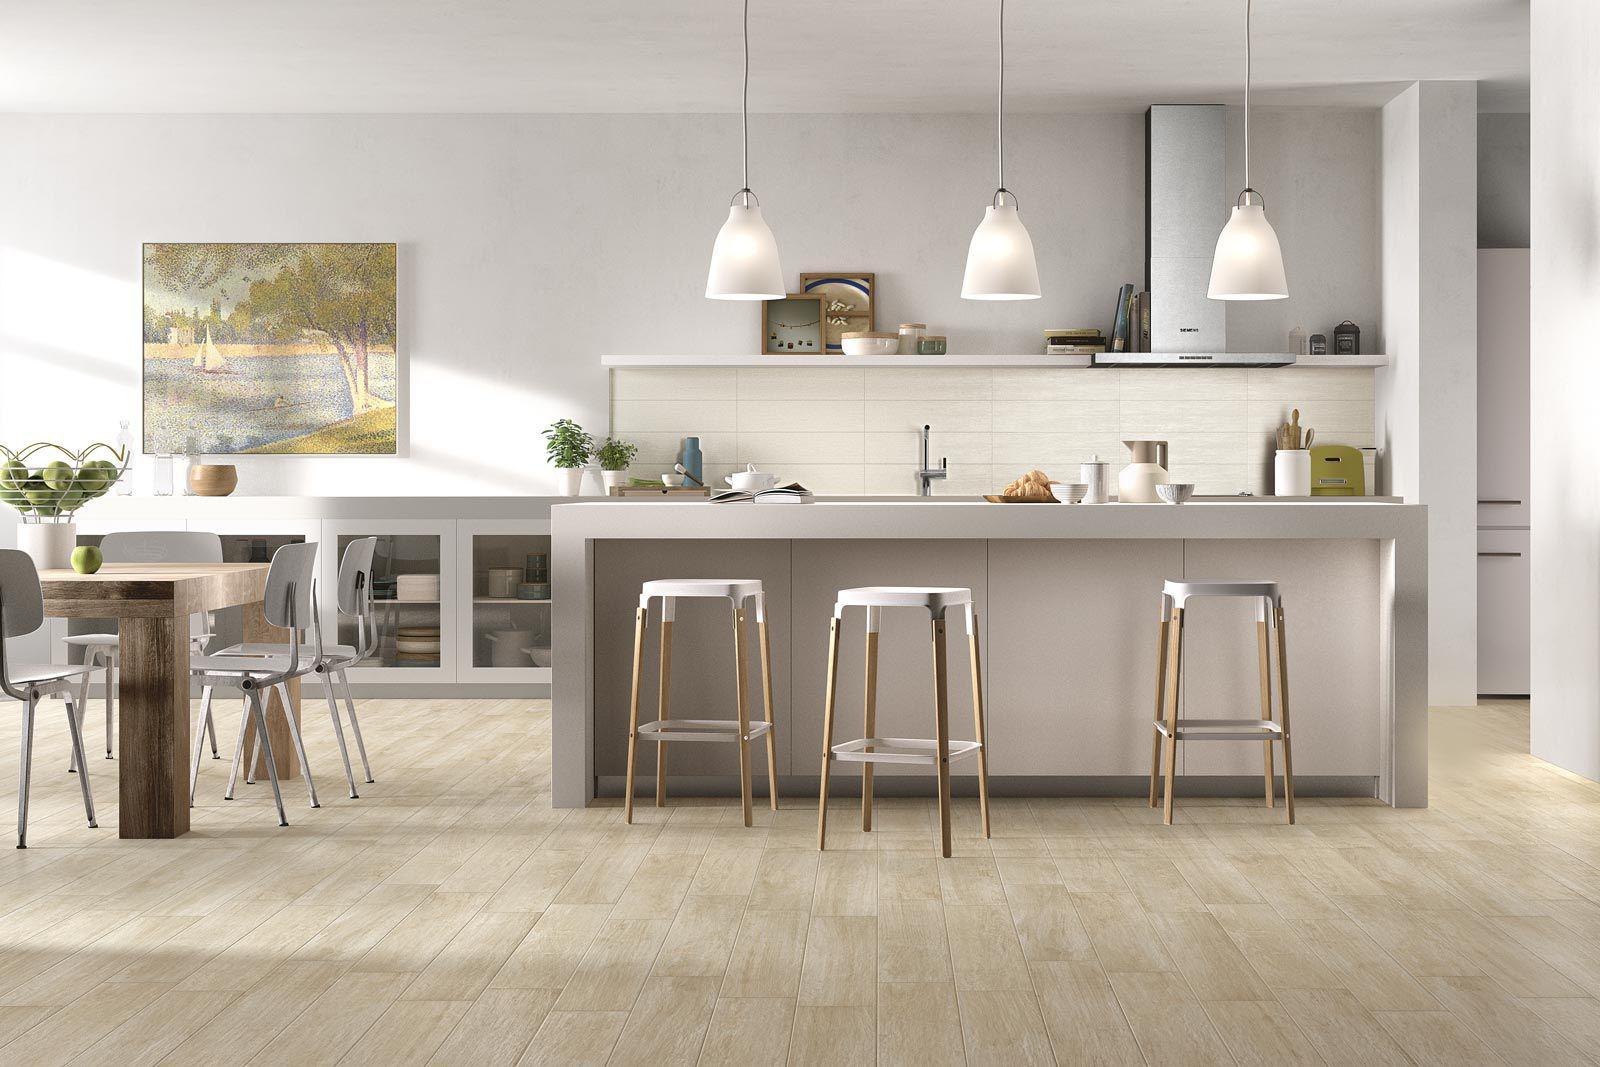 Cucina finto legno gres effetto legno cucina isola per cucina